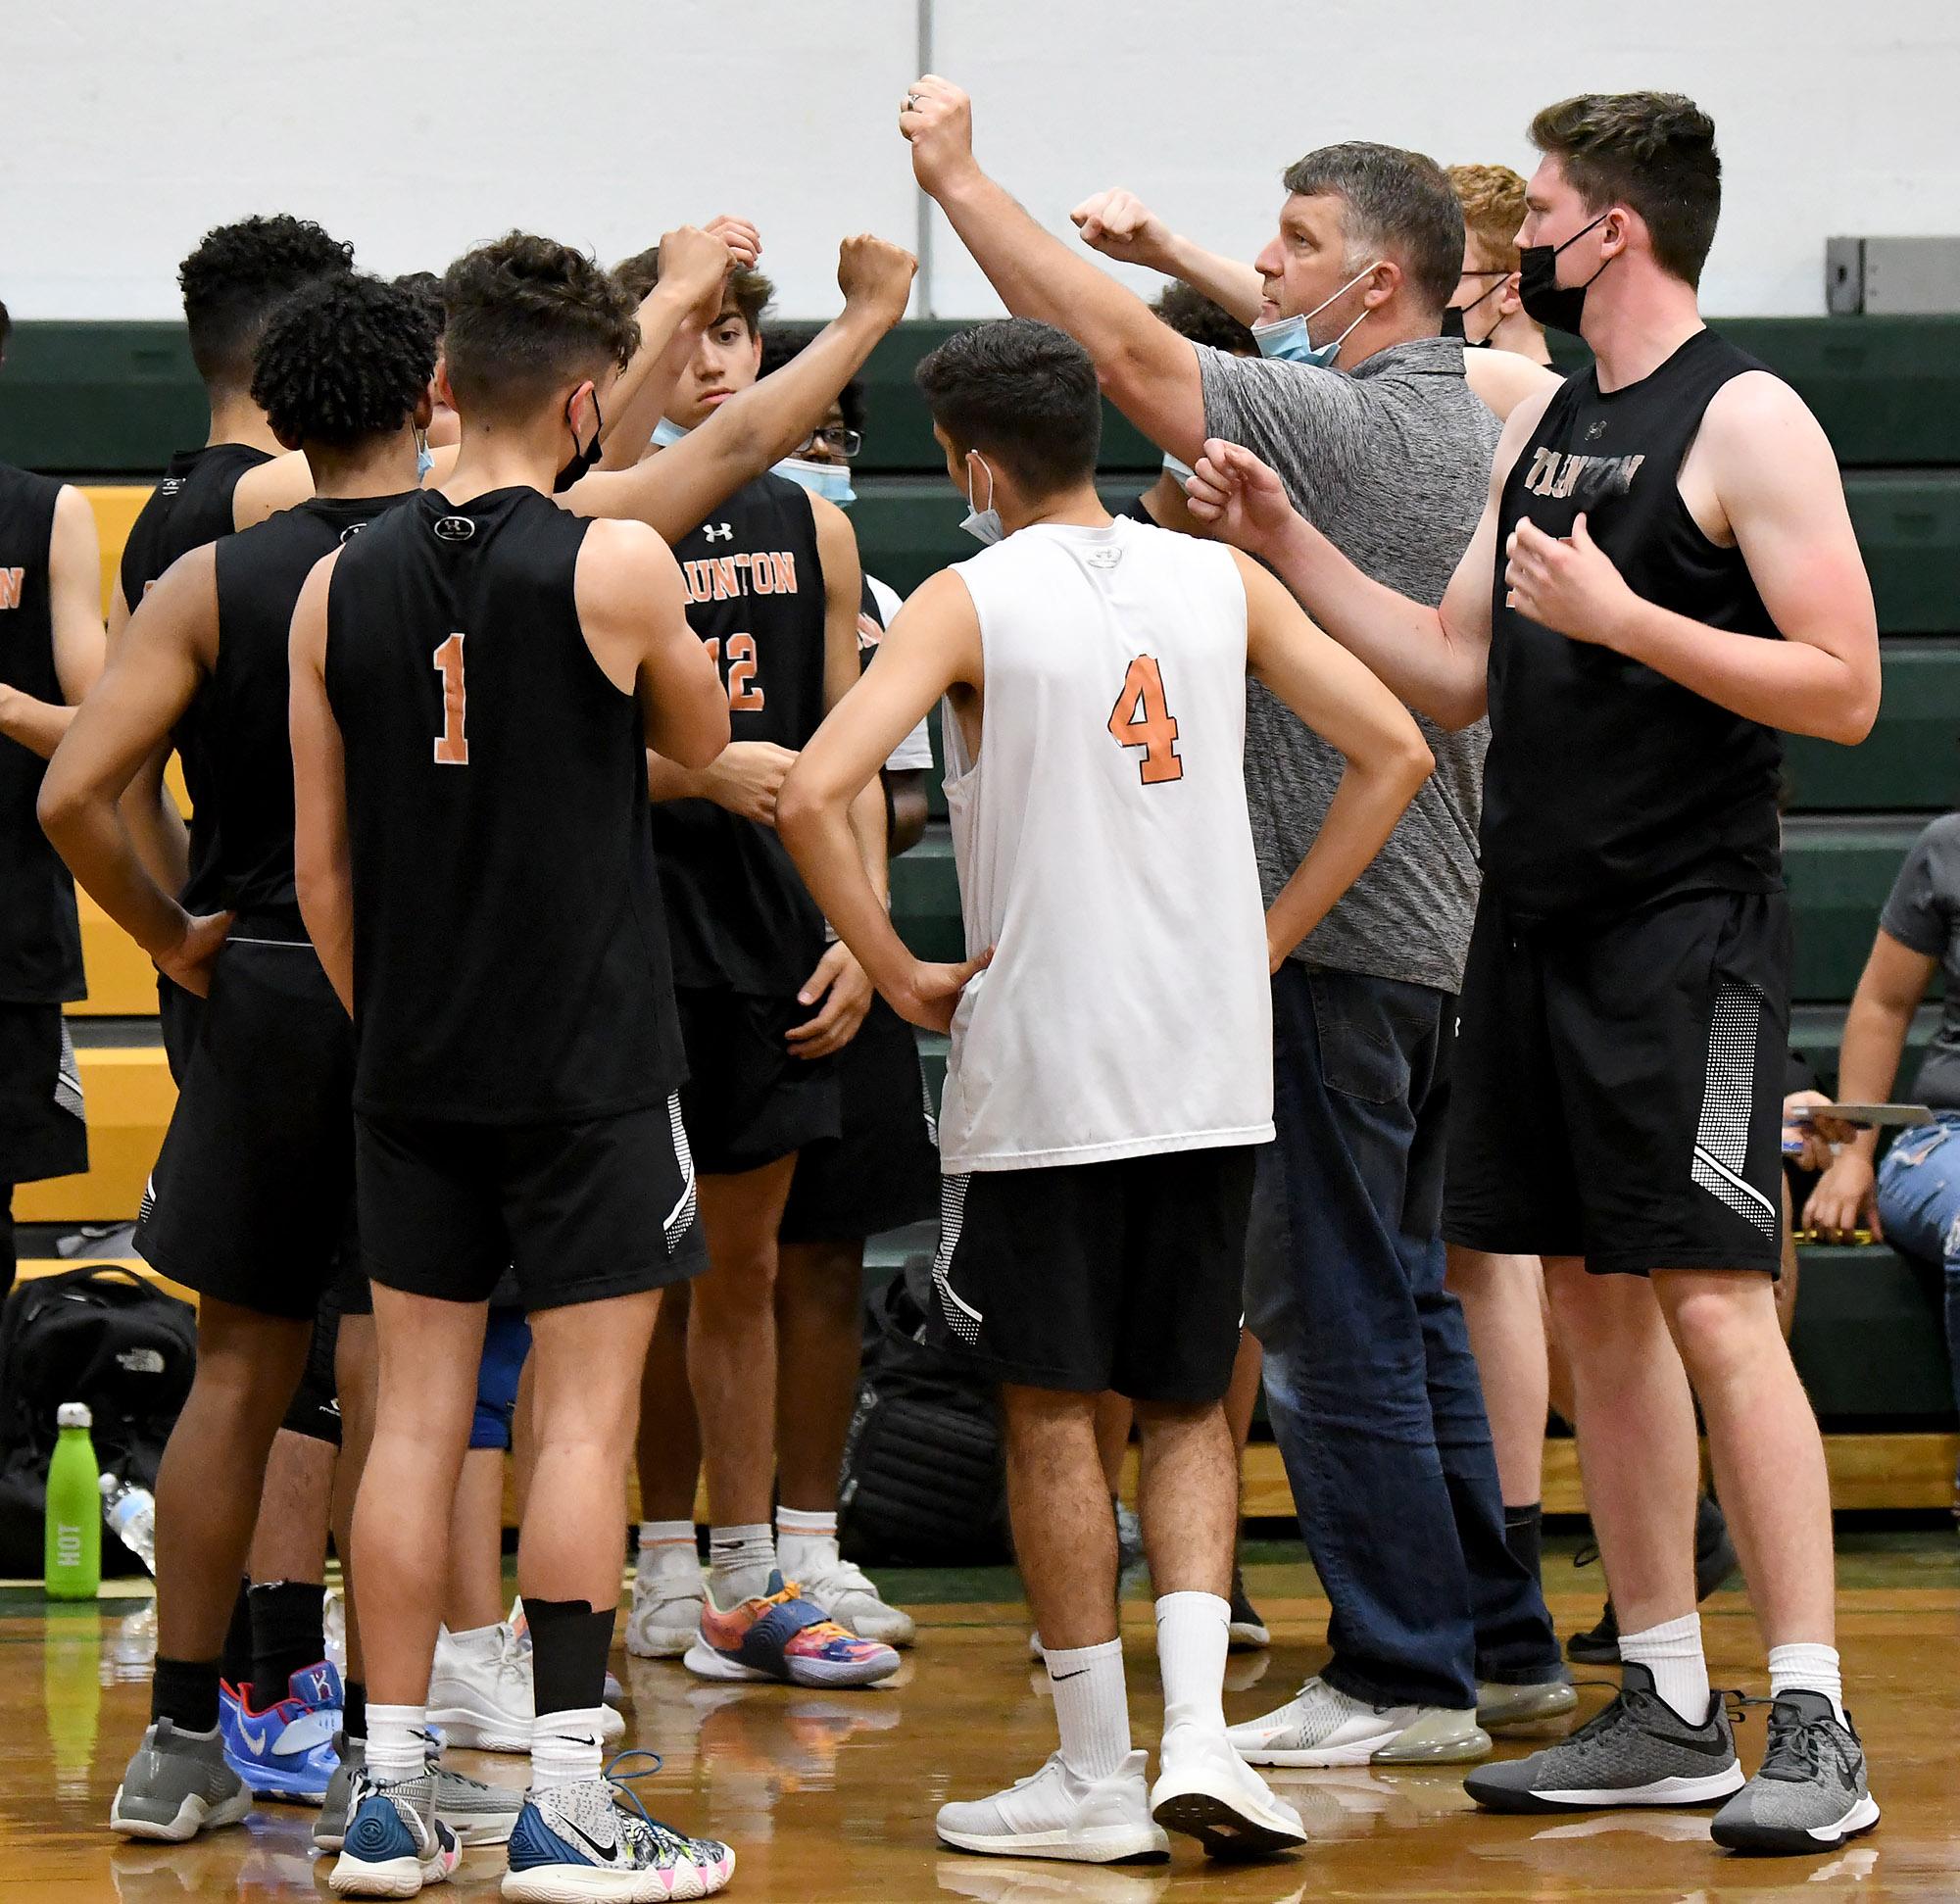 Taunton High boys volleyball coach Toby Chaperon has led his team to a strong season.